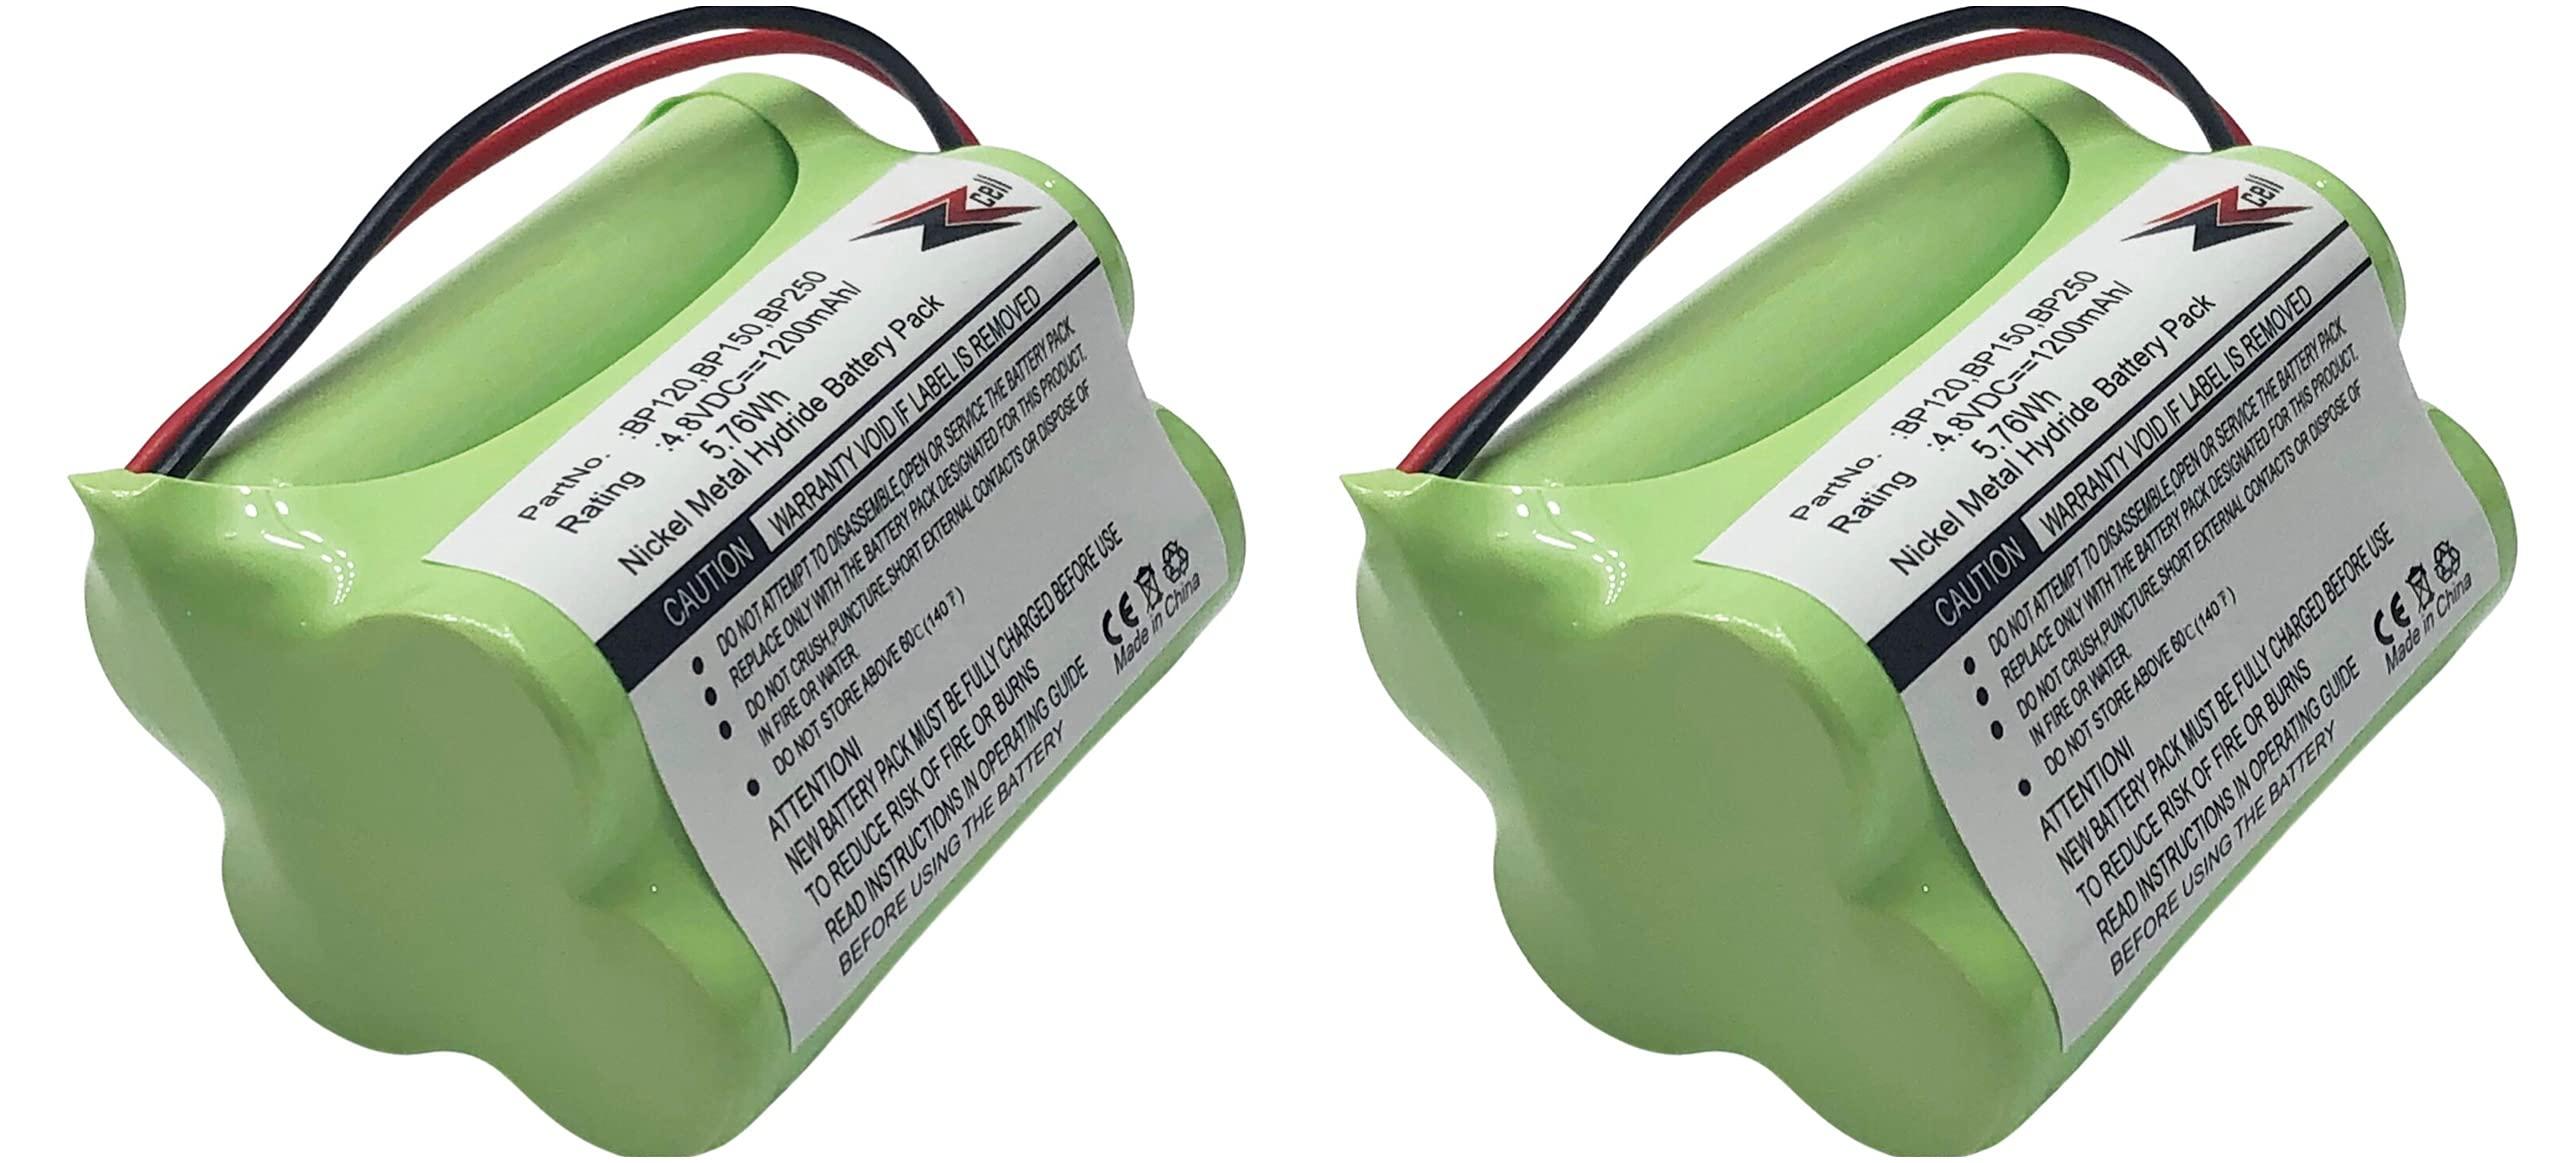 2 Bateria P/ Bearcat Sportcat BP120 BP150 BP180 BP250 Uniden